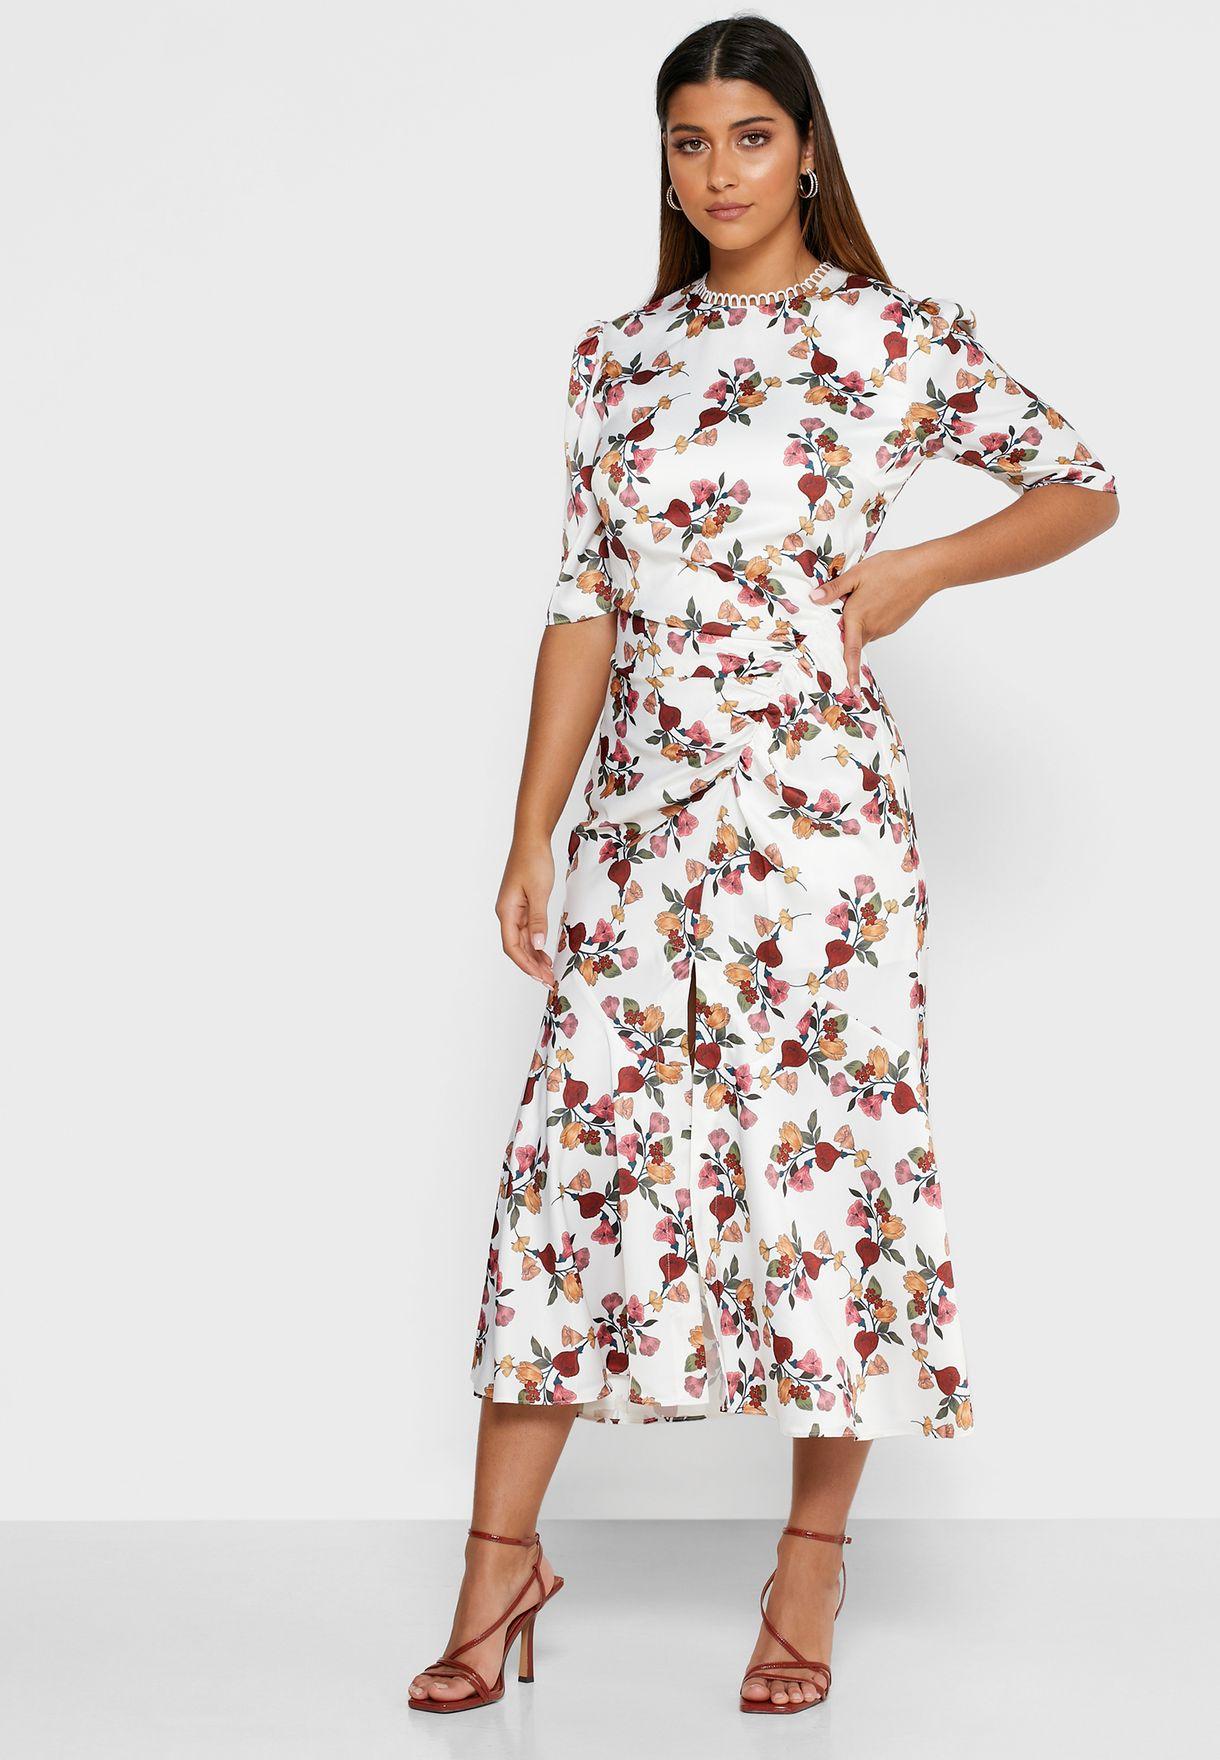 Everlasting Floral Print High Neck Dress